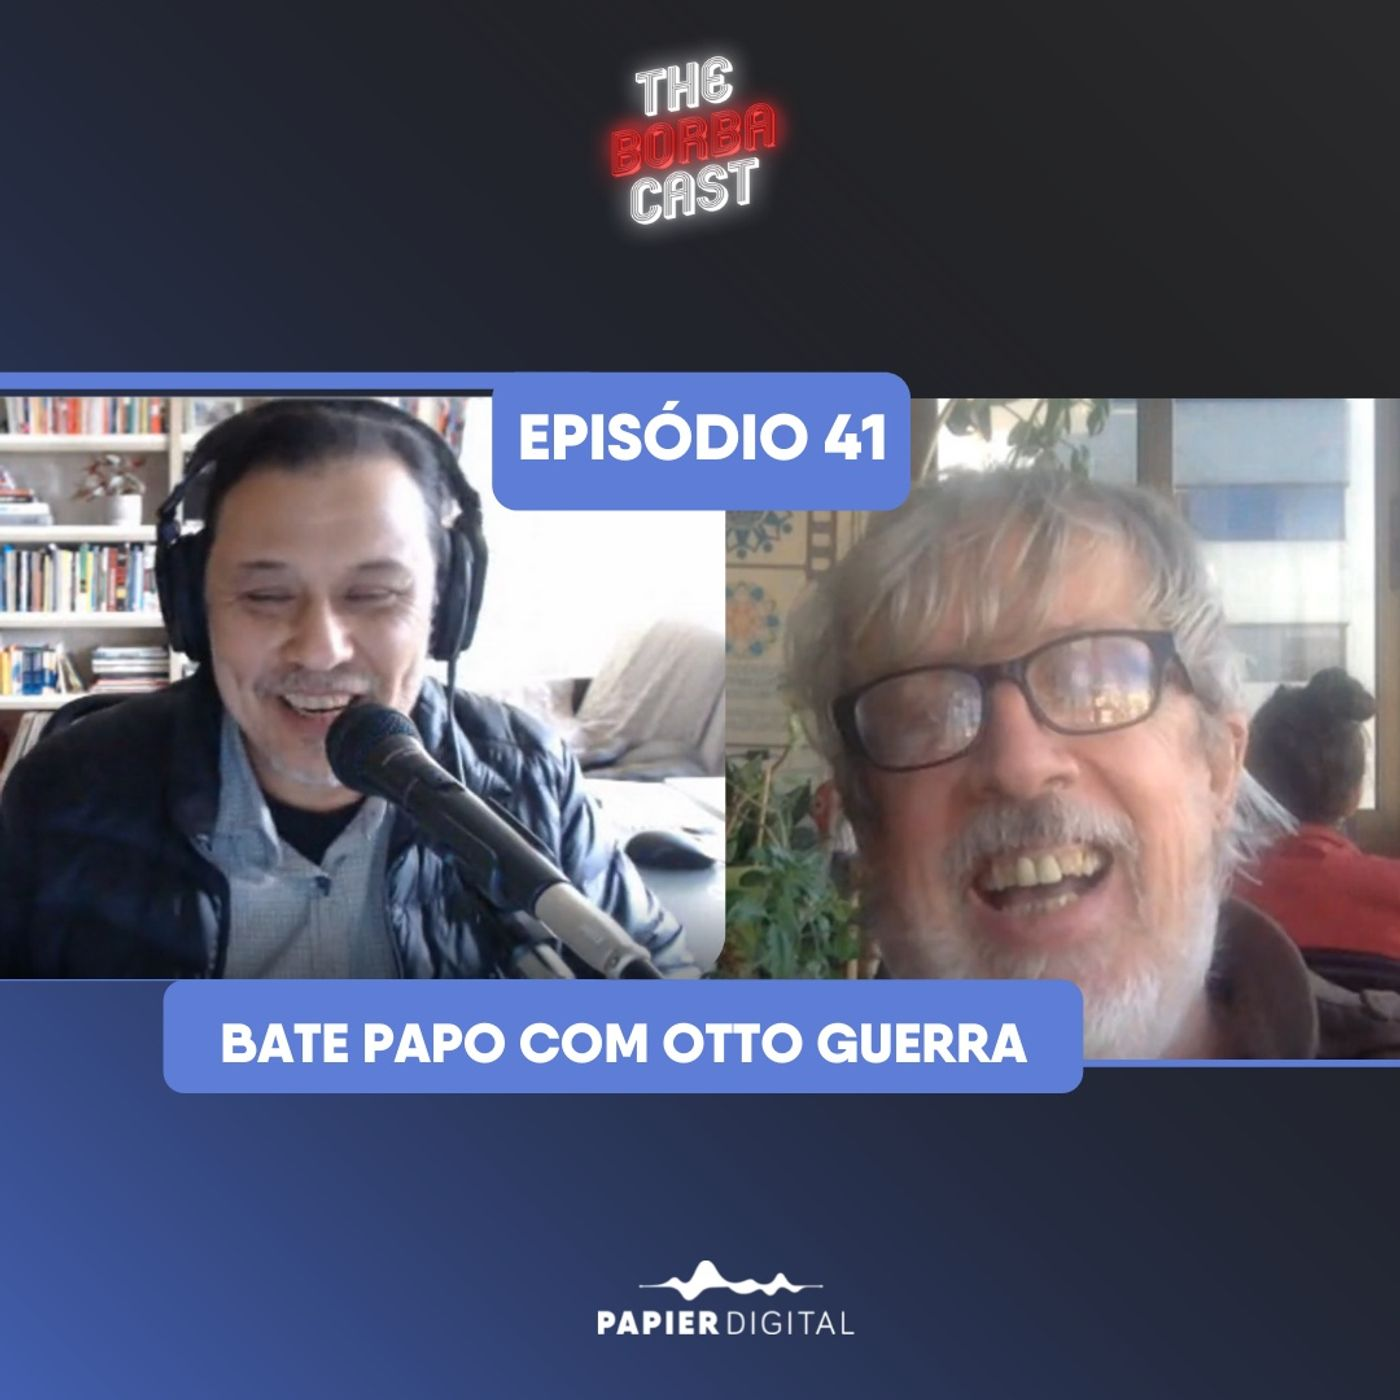 Episódio 41: Bate papo com Otto Guerra